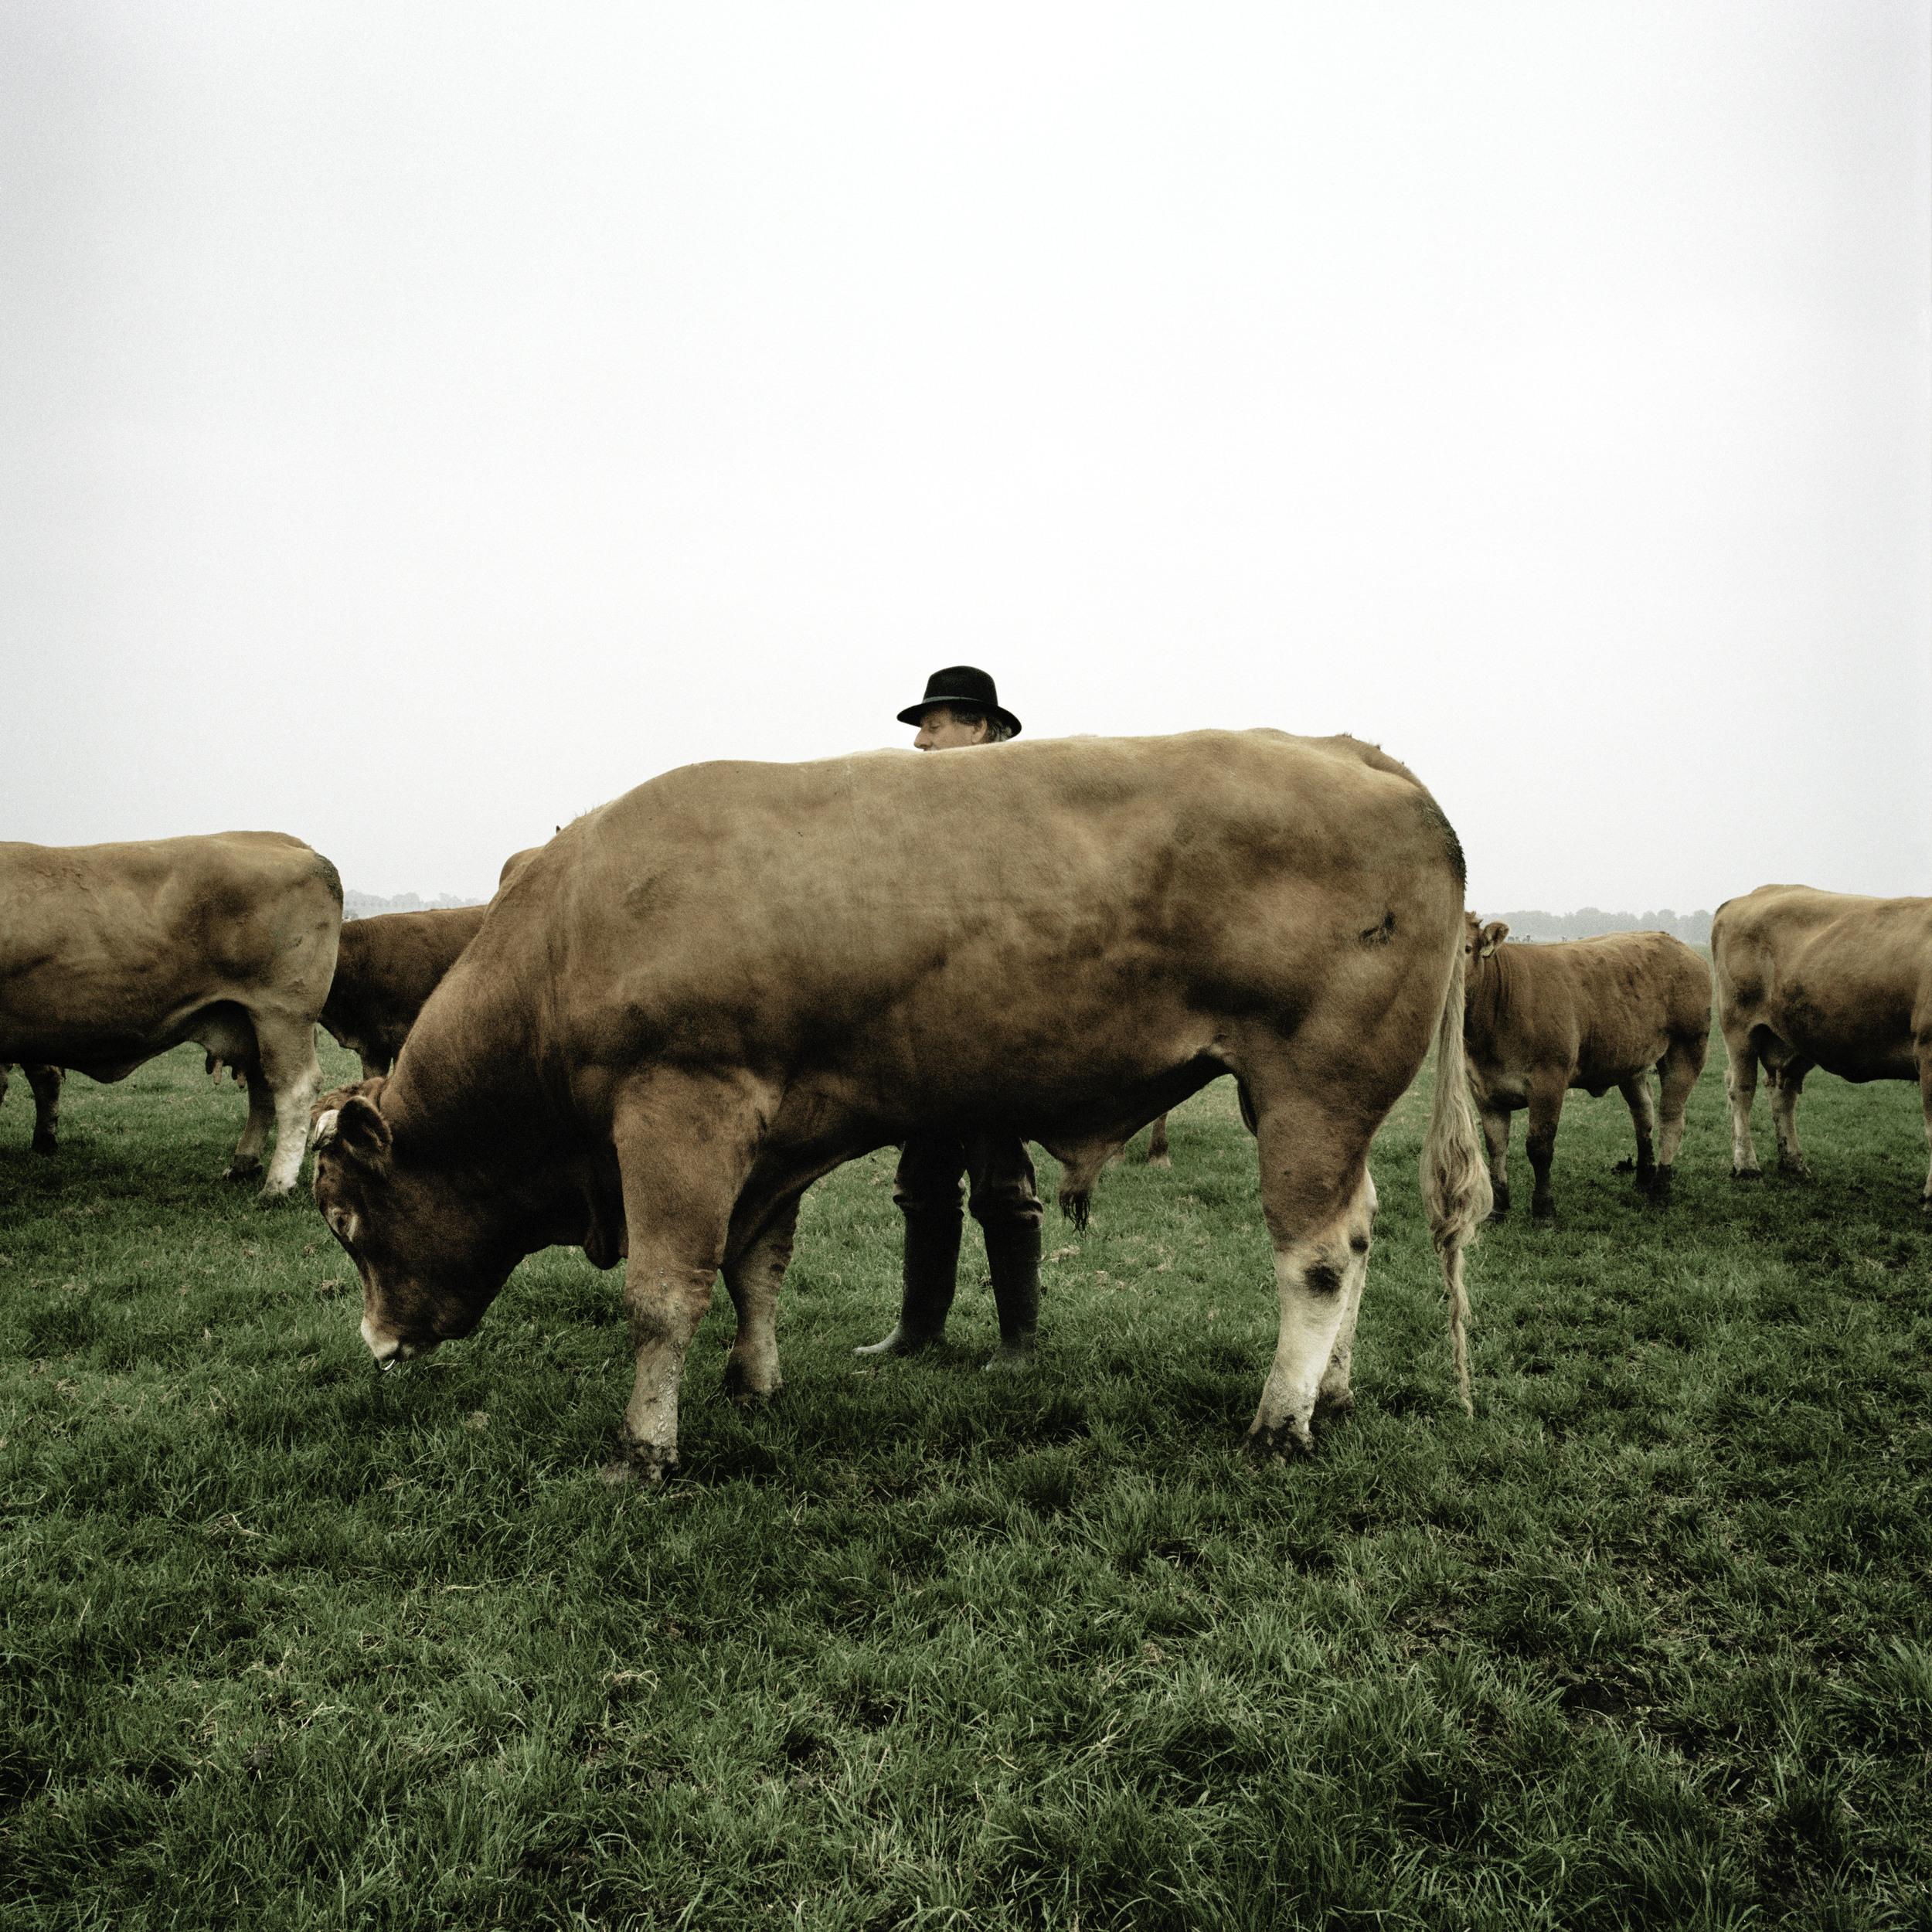 Evert Hogenes en Limousin stier, Middenbeemster